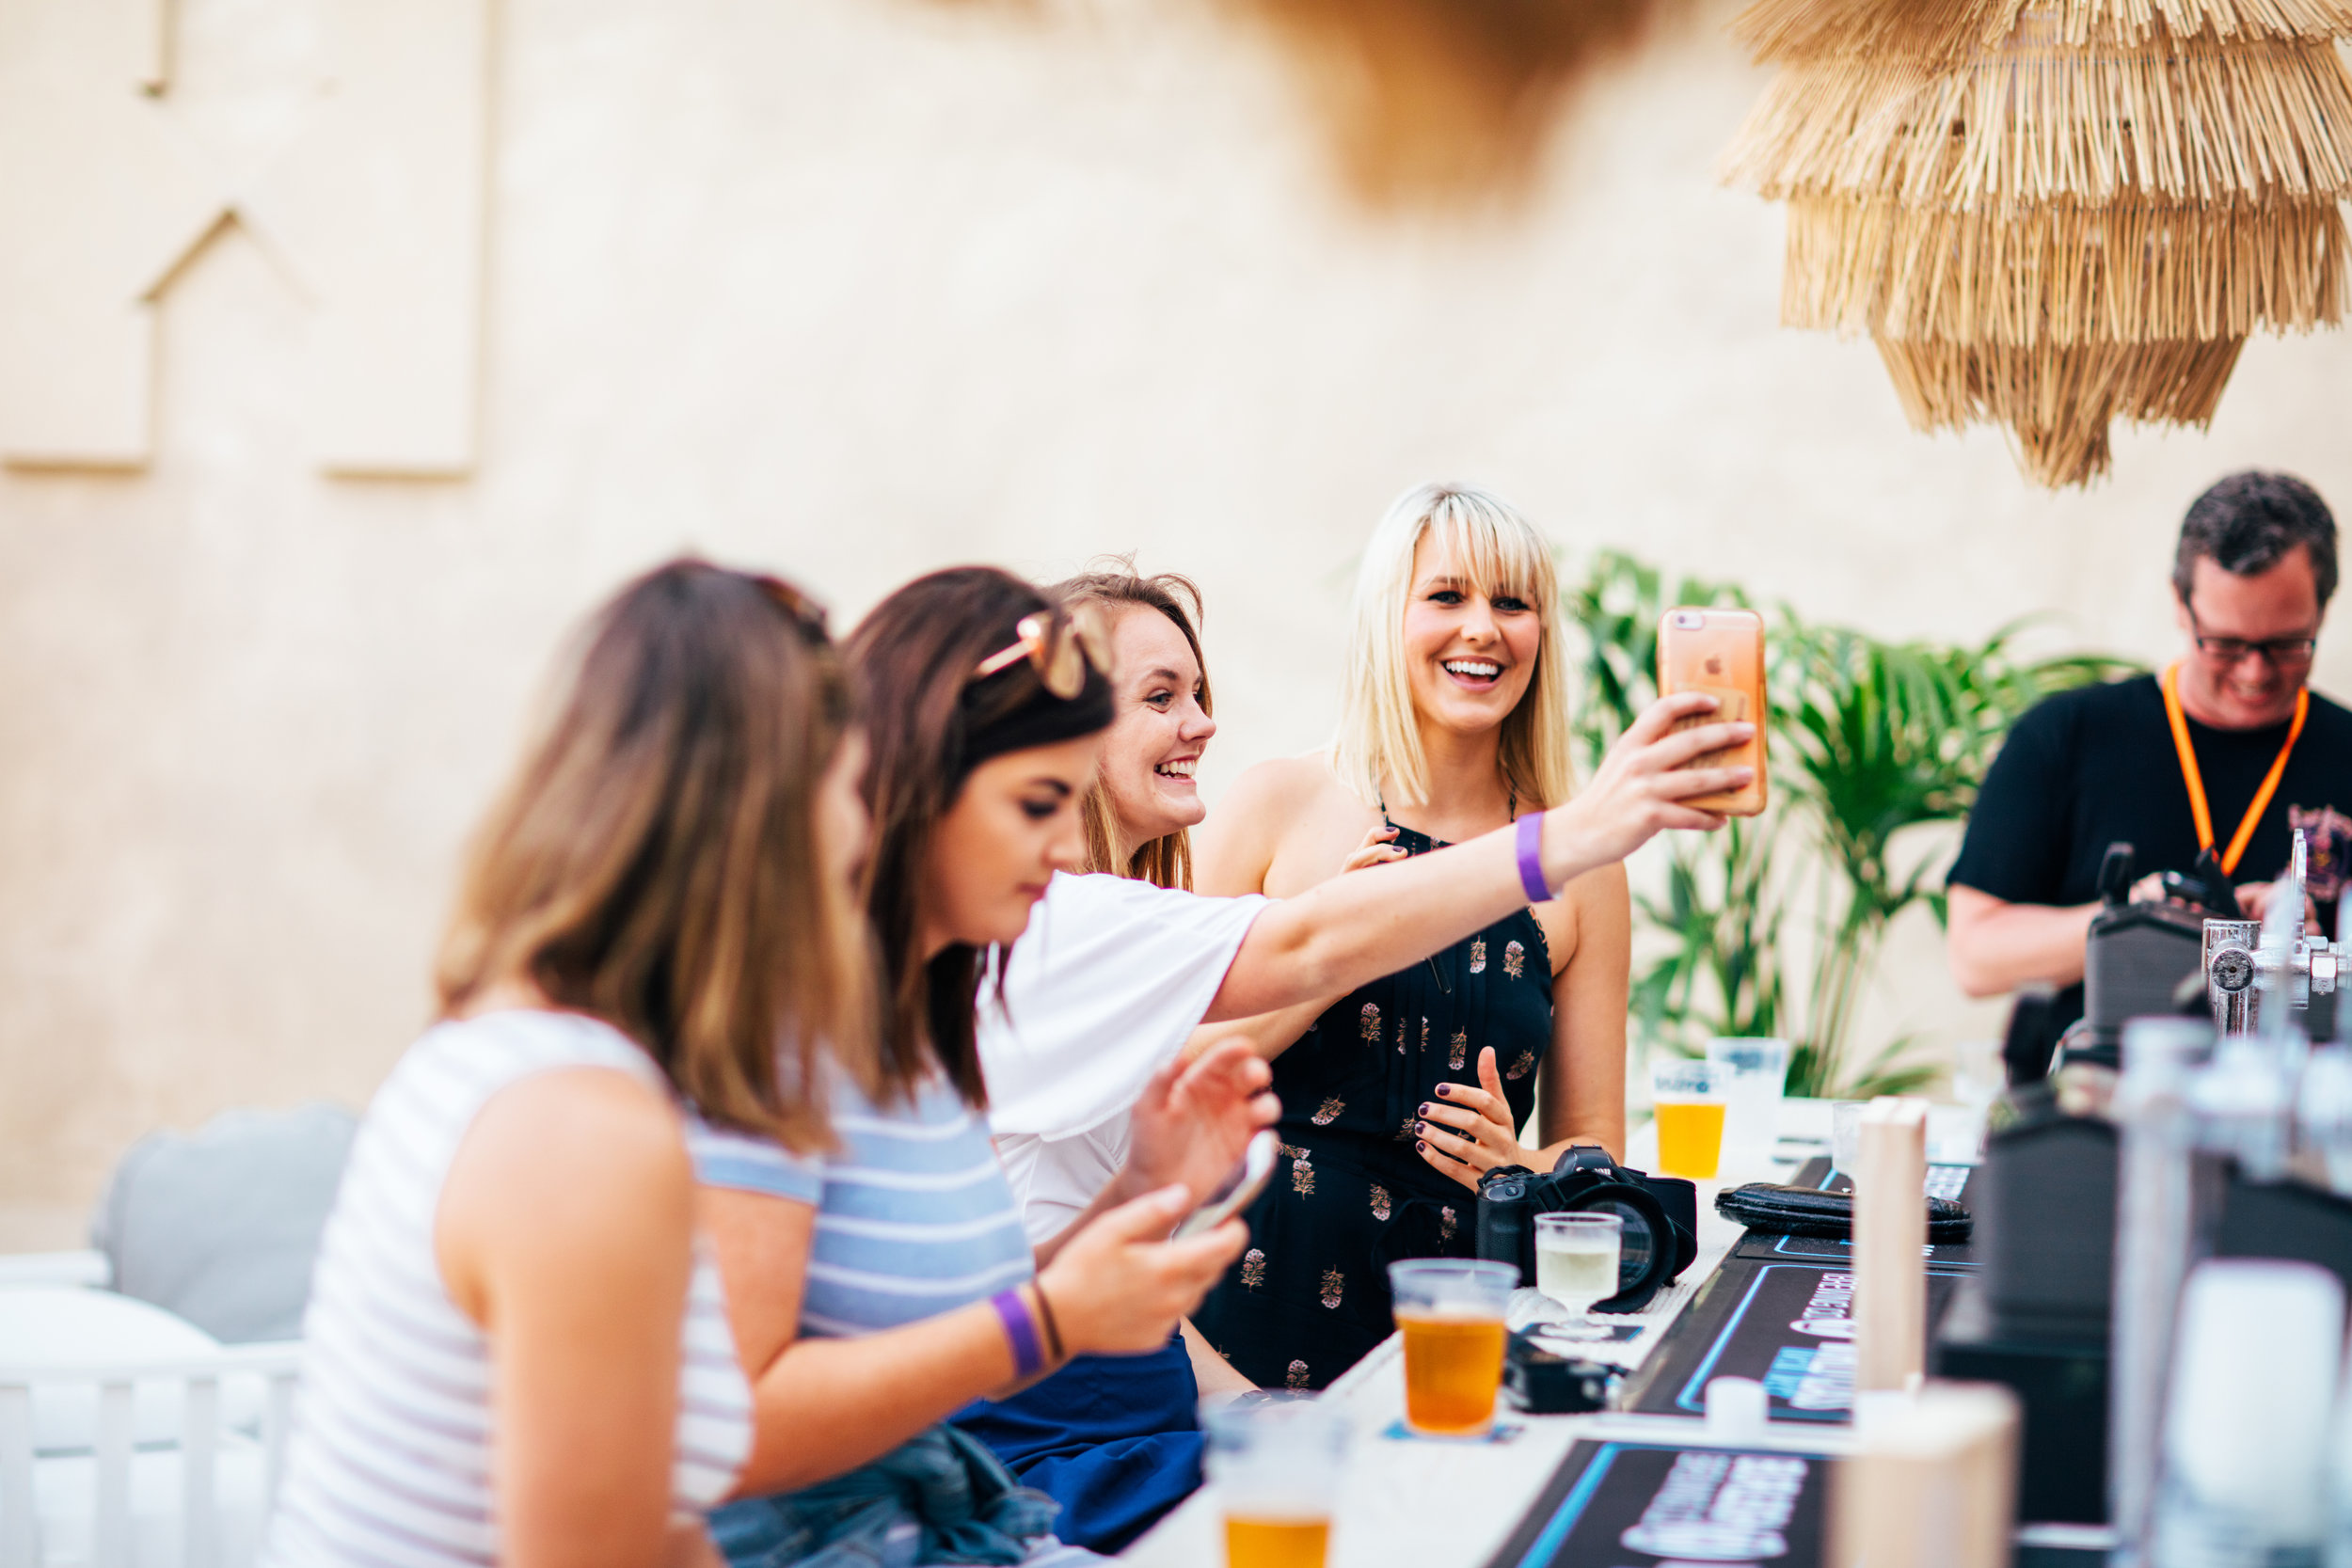 Sand Hostel  selfies at the bar.jpg